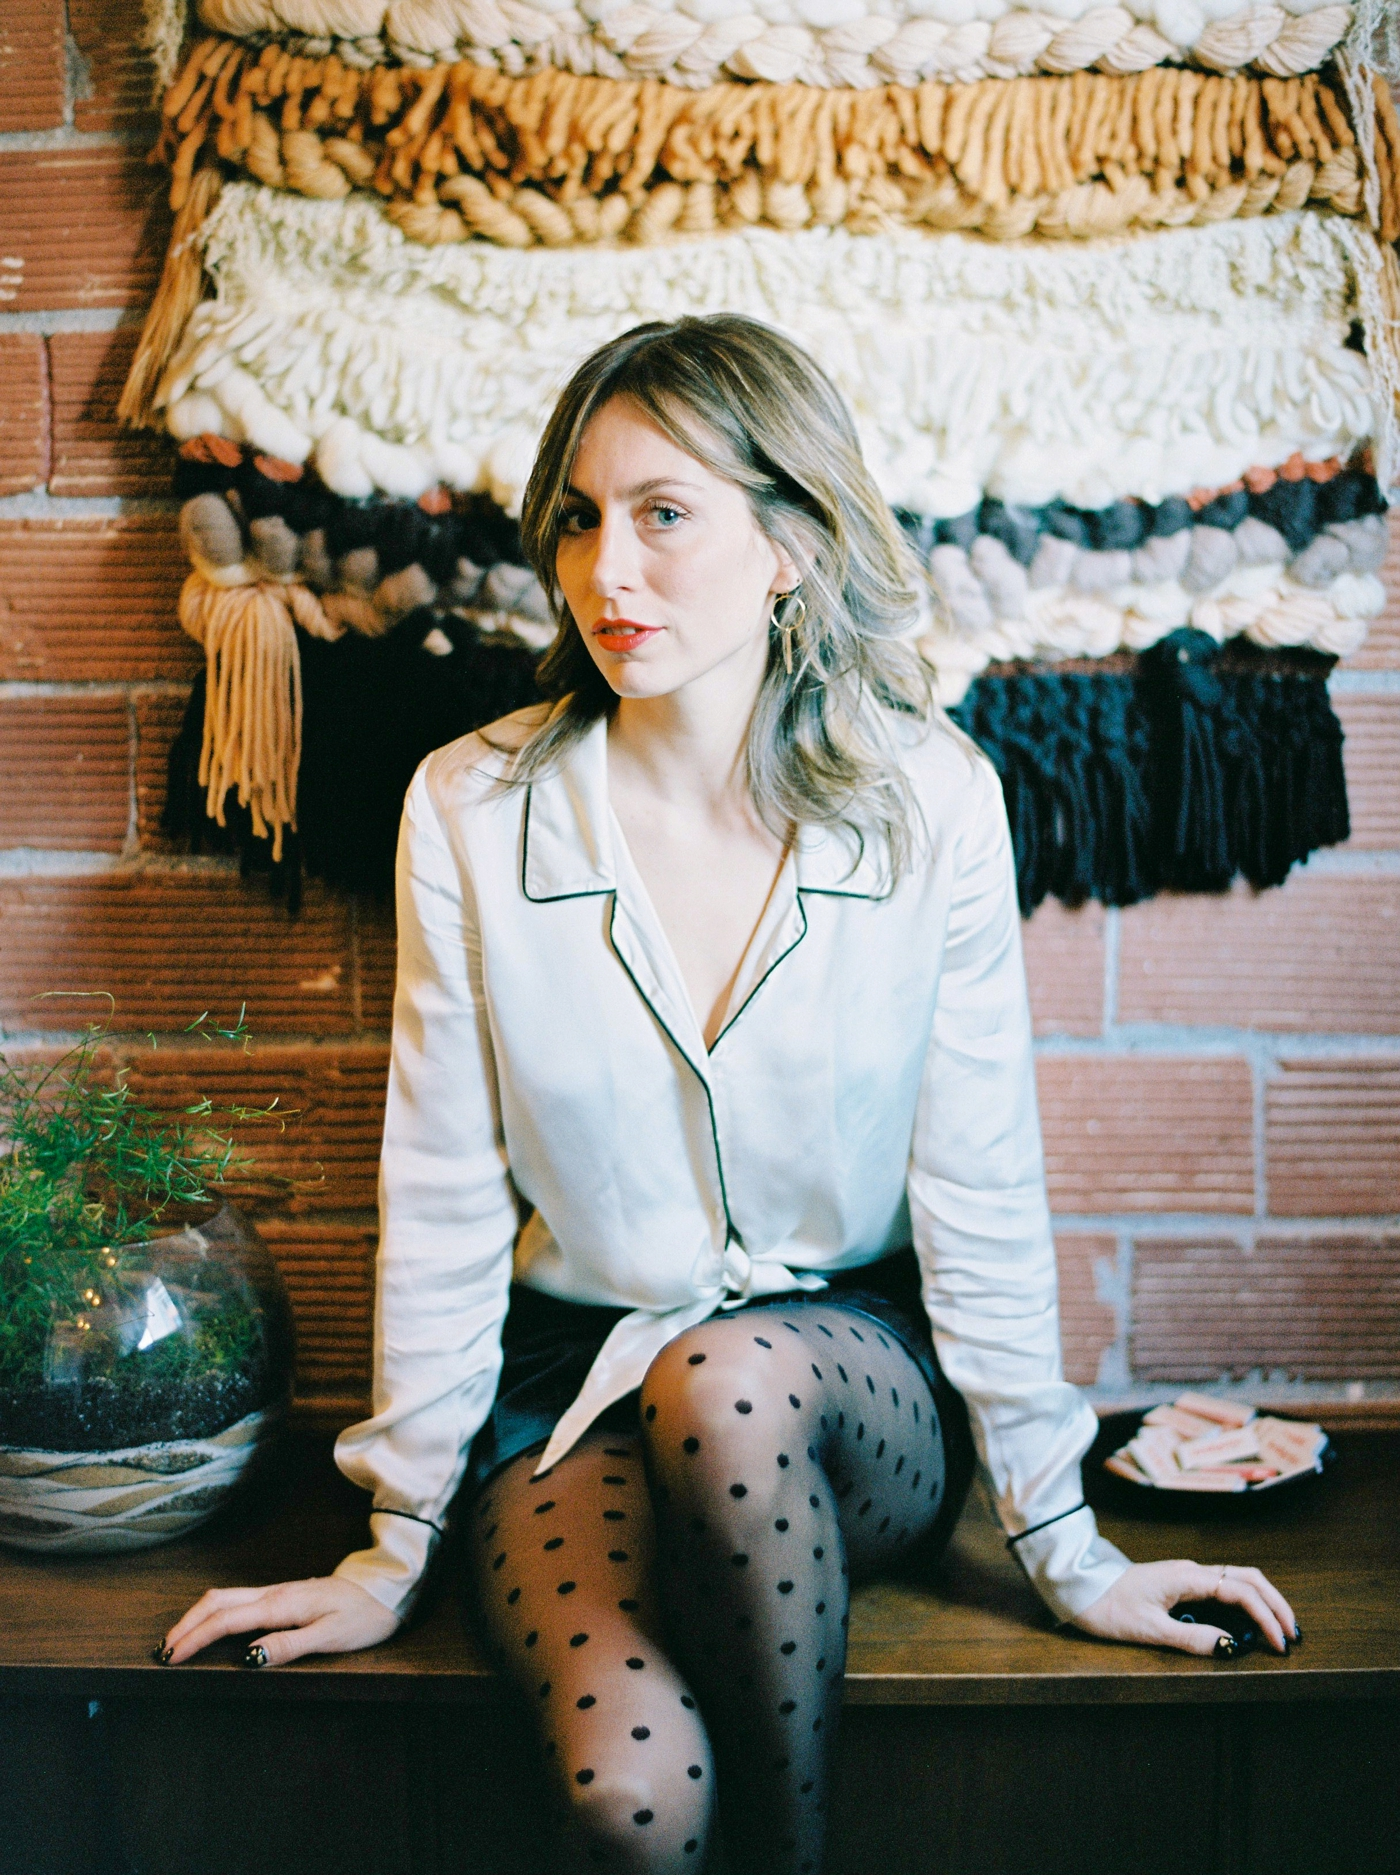 Life Set Sail at Bridgette Bar | Calgary fashion photographer and blogger | Justine Milton Photography